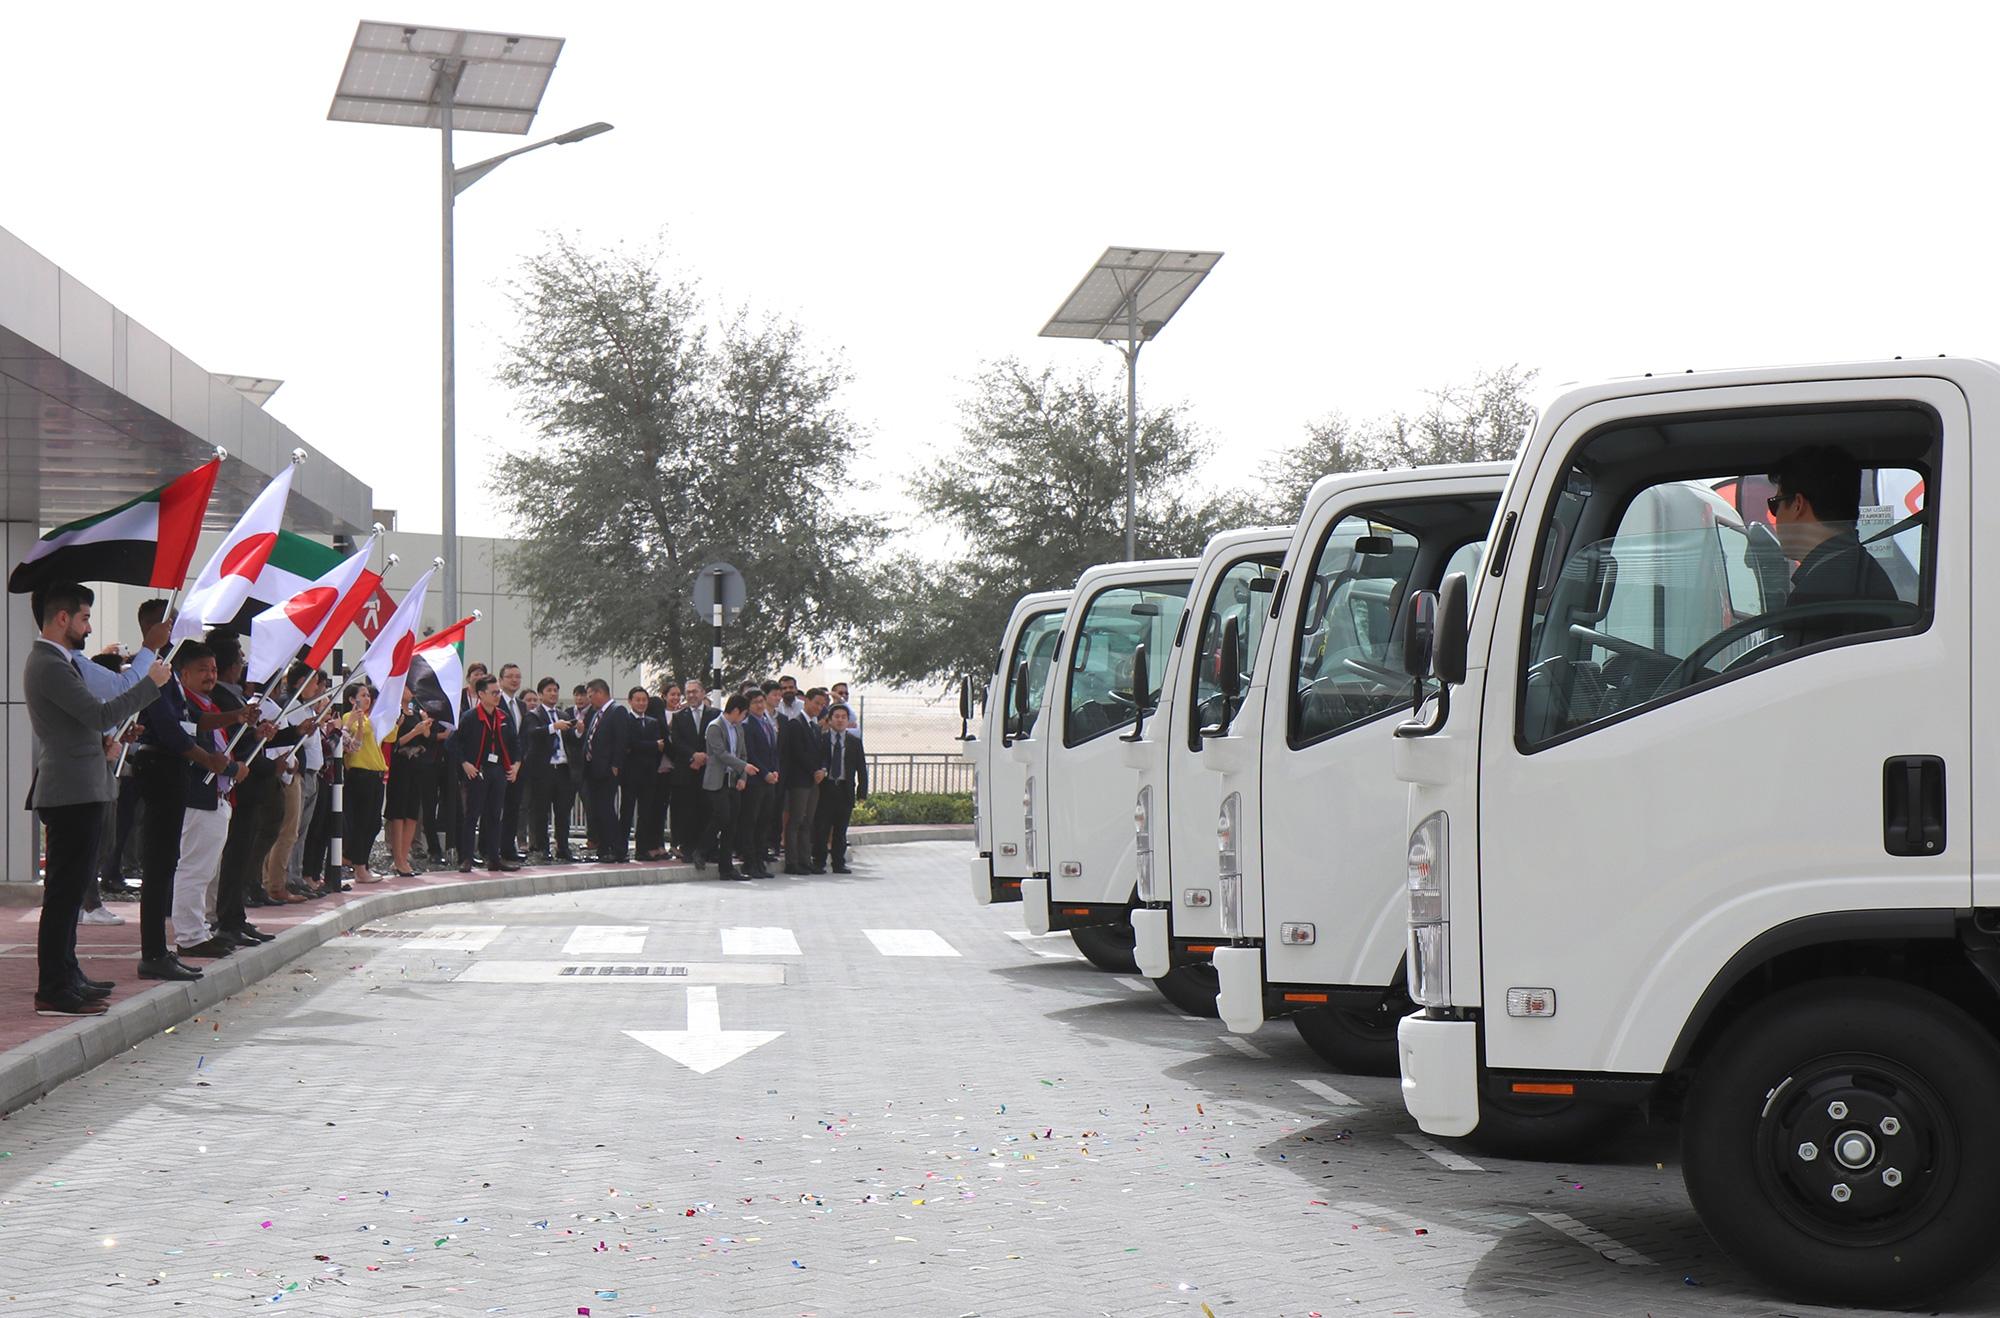 Isuzu Established IDC in Dubai to reach immediate Truck Delivery